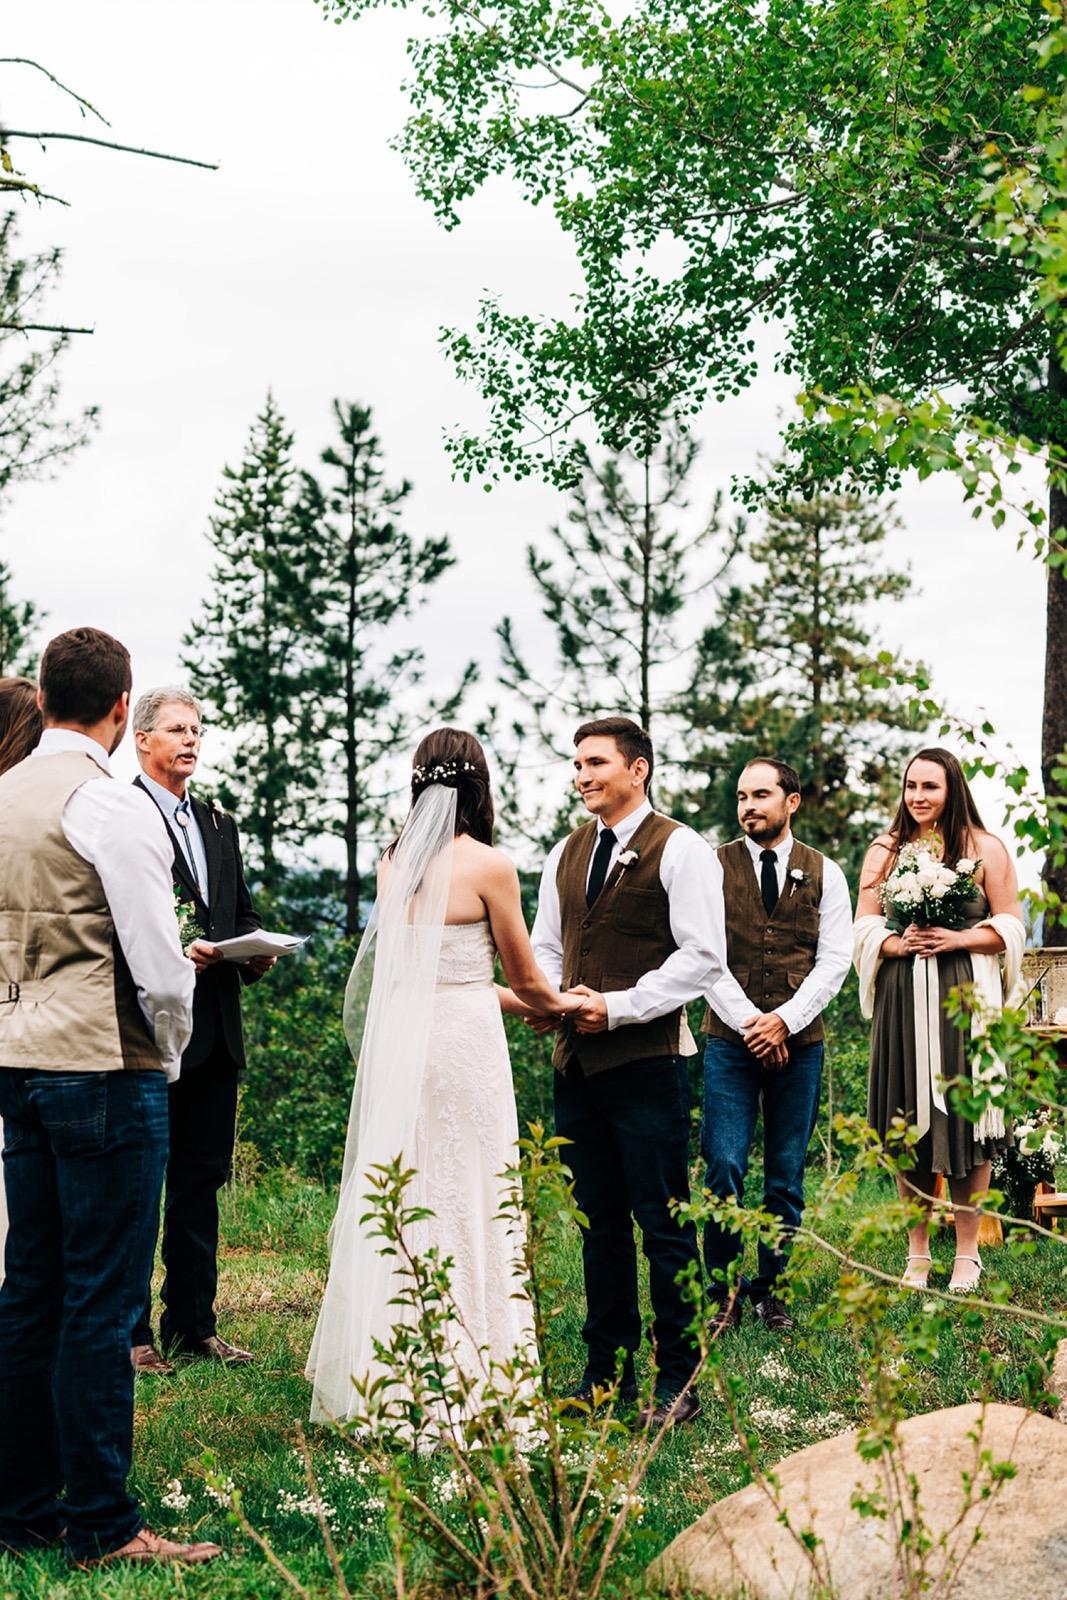 040_katie_chris_wedding-84.jpg